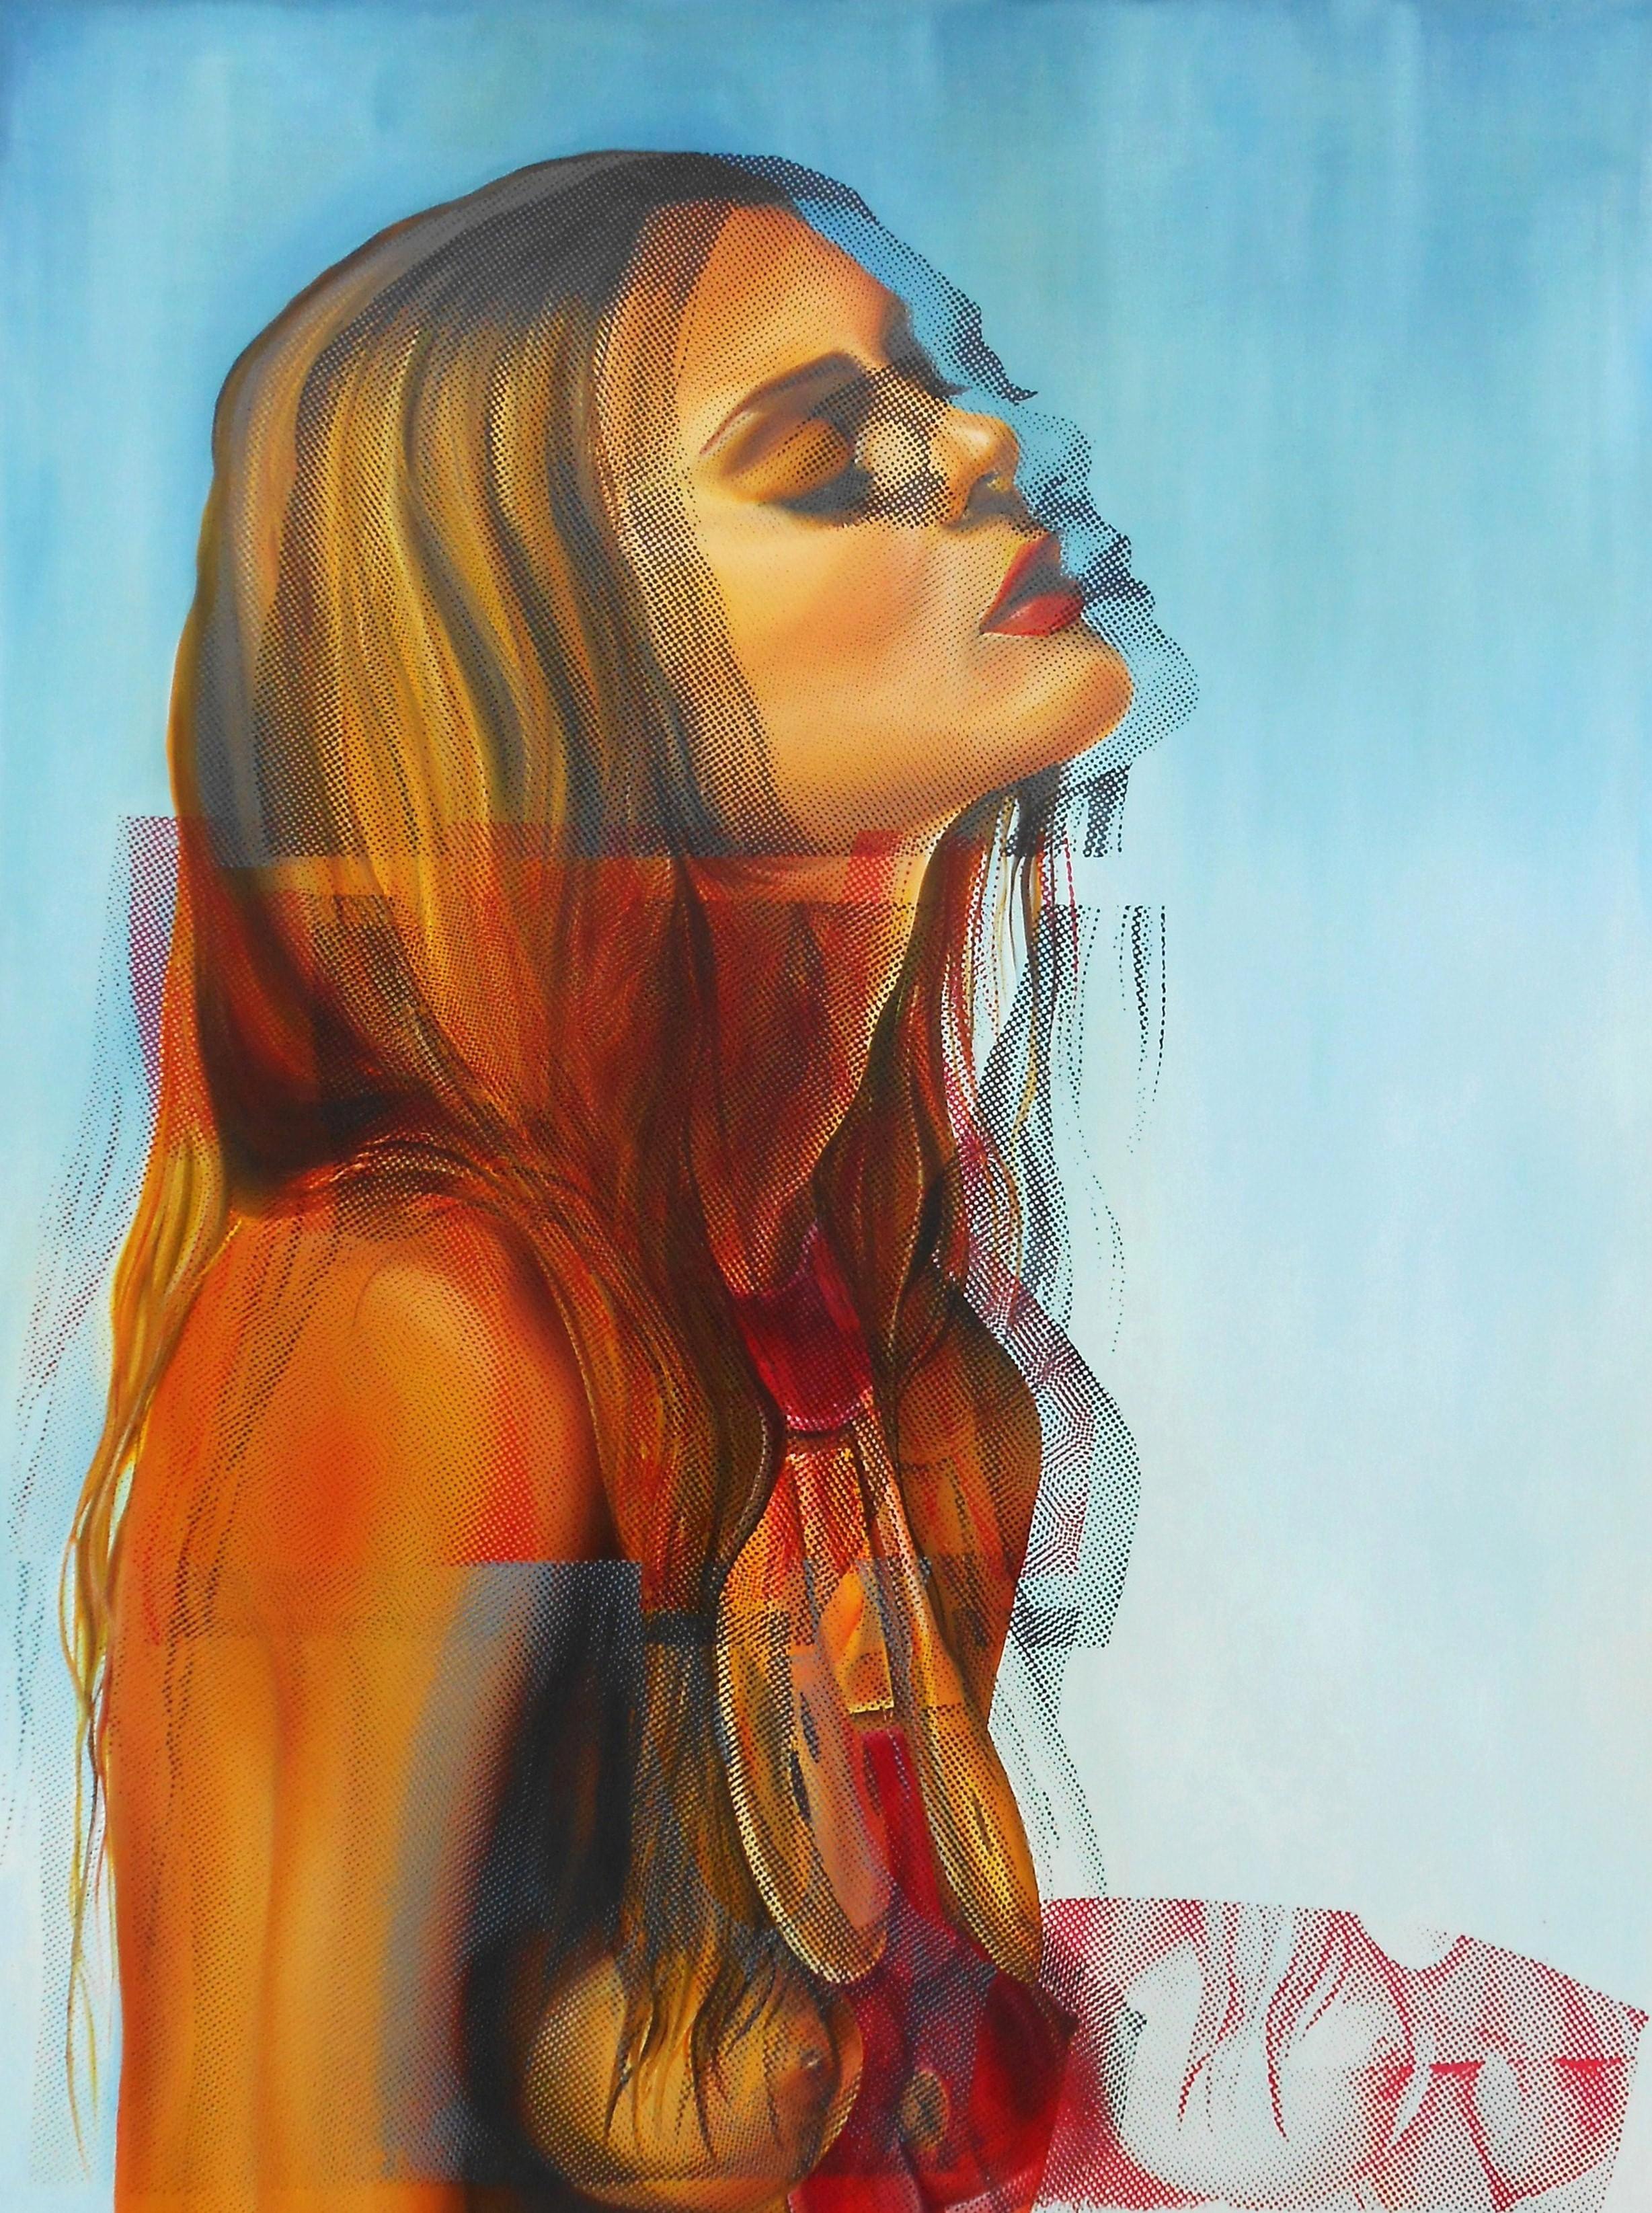 Metamorphosis of the Girl Next Door, oil and silk screen on canvas, 150 x 200cm.  Prints.